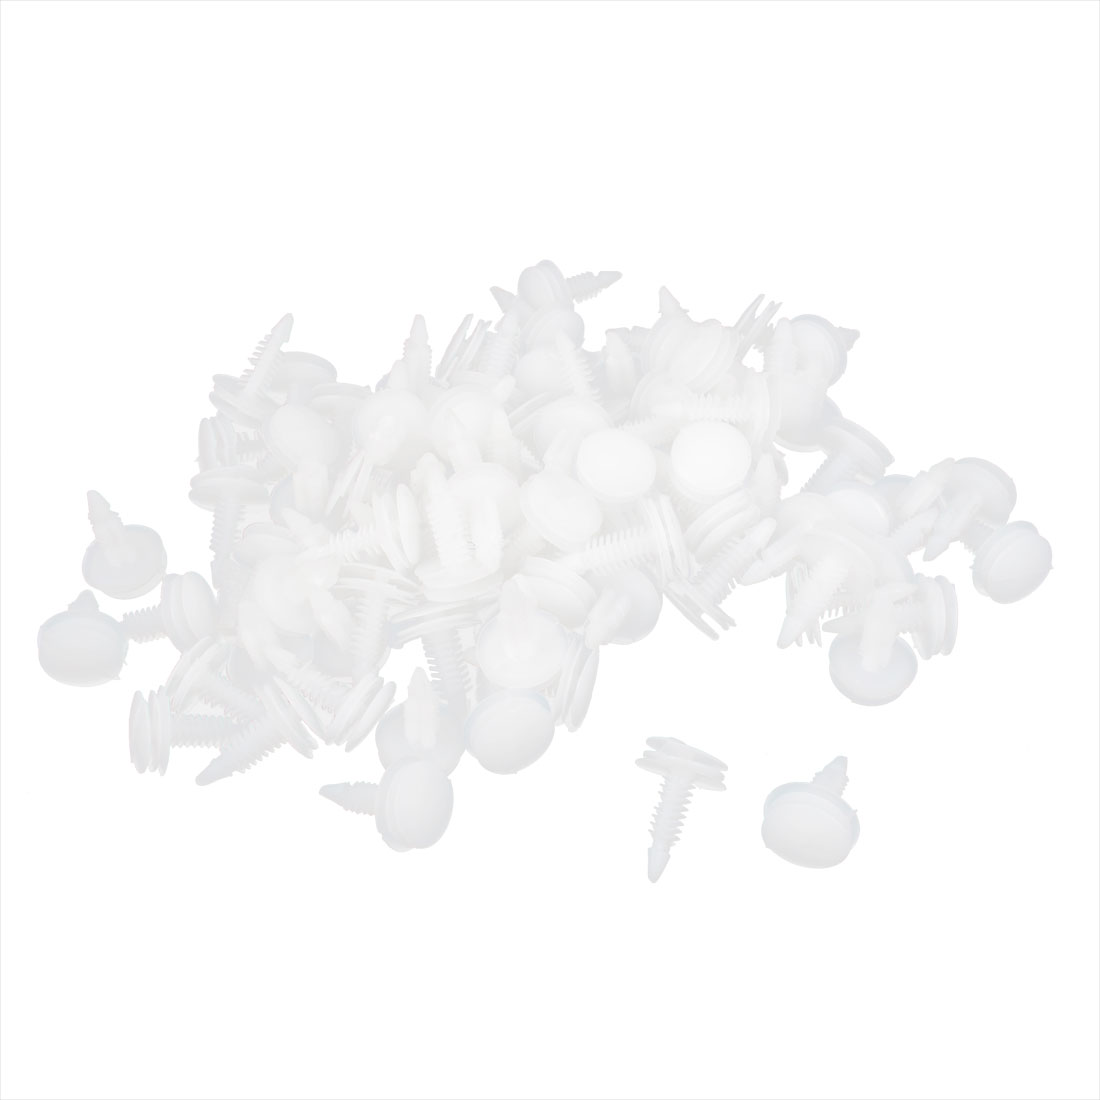 100PCS 8 x 18mm Hole Plastic Rivet Fastener Panel Fixings Clips White for Car Auto